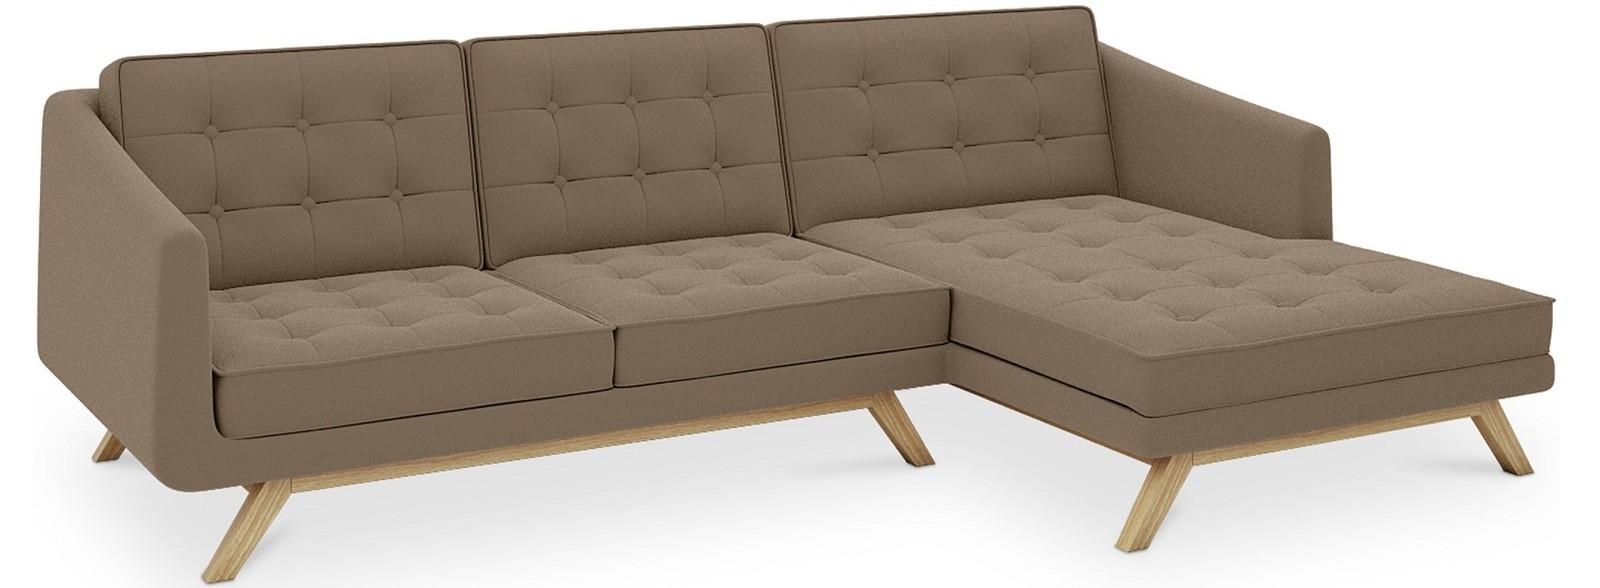 canap d 39 angle droit scandinave tissu marron carlos. Black Bedroom Furniture Sets. Home Design Ideas